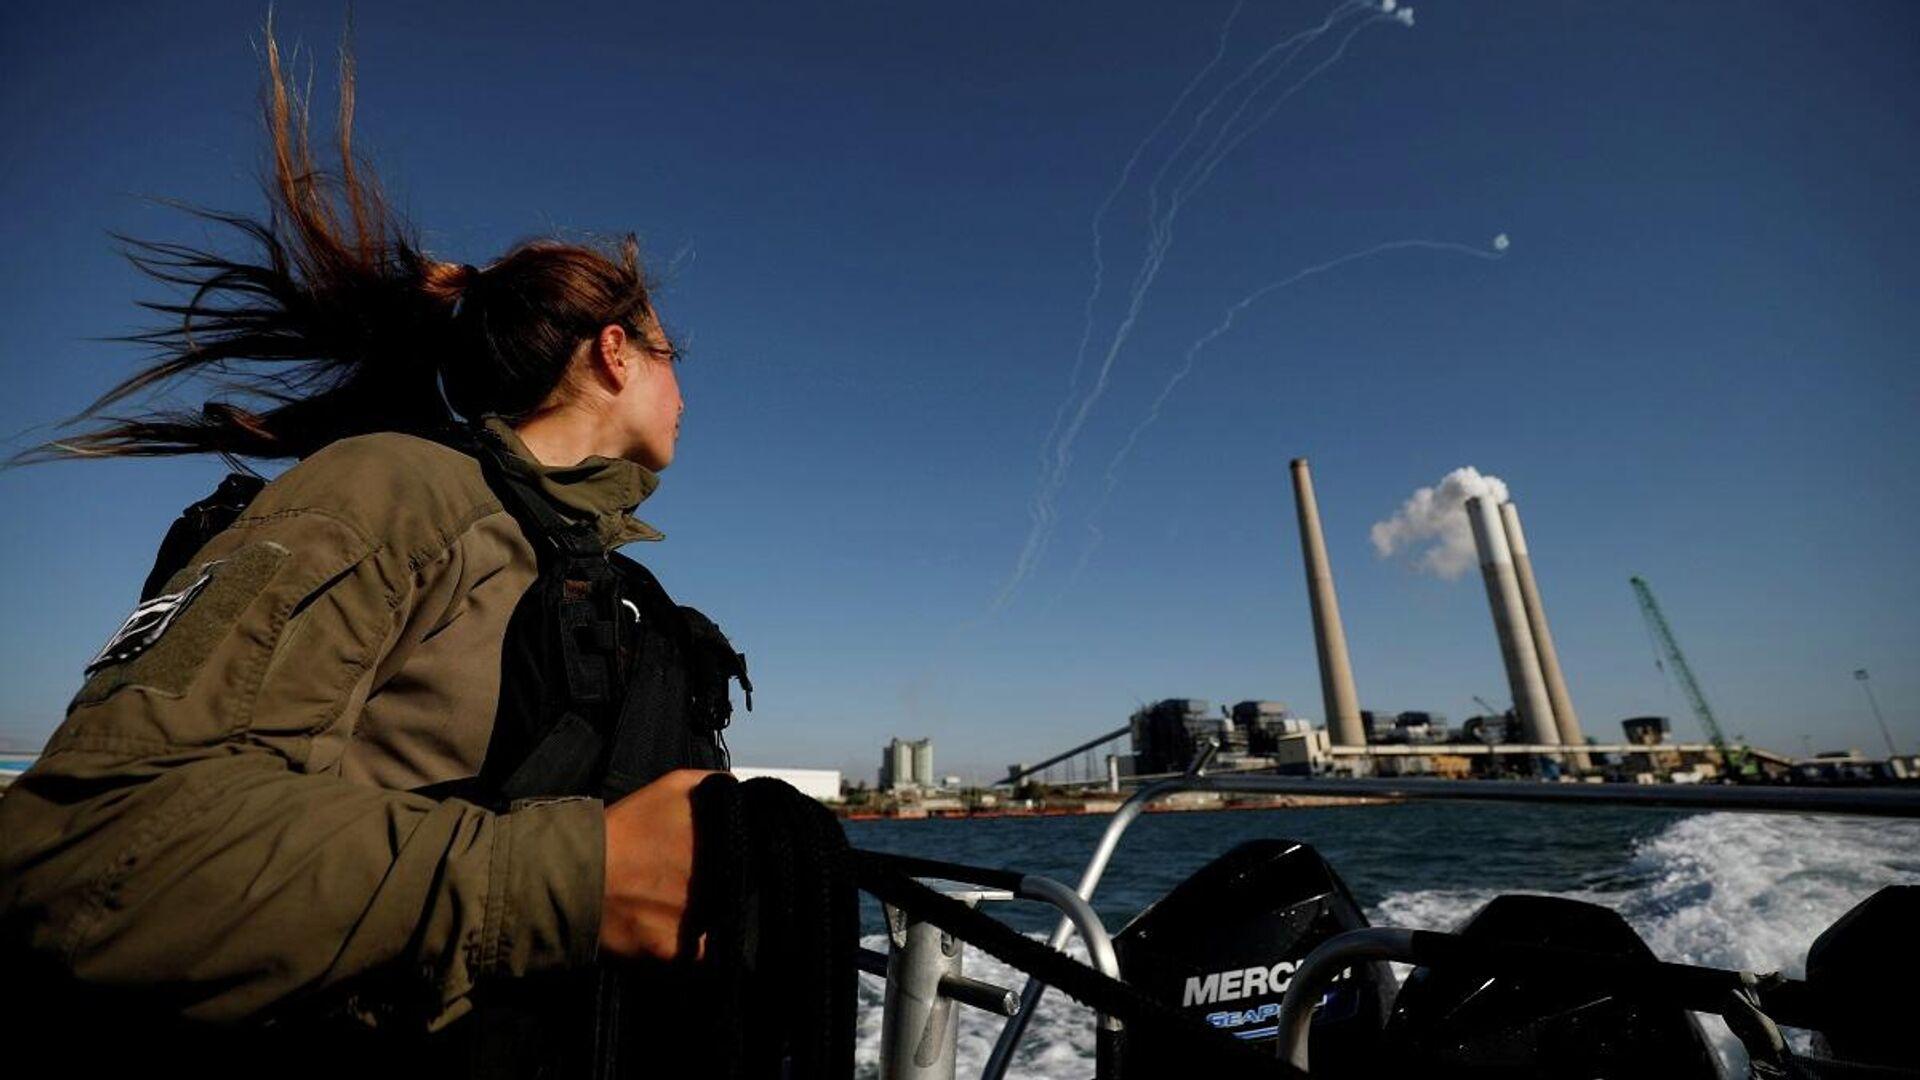 Una mujer soldado israelí - Sputnik Mundo, 1920, 23.05.2021